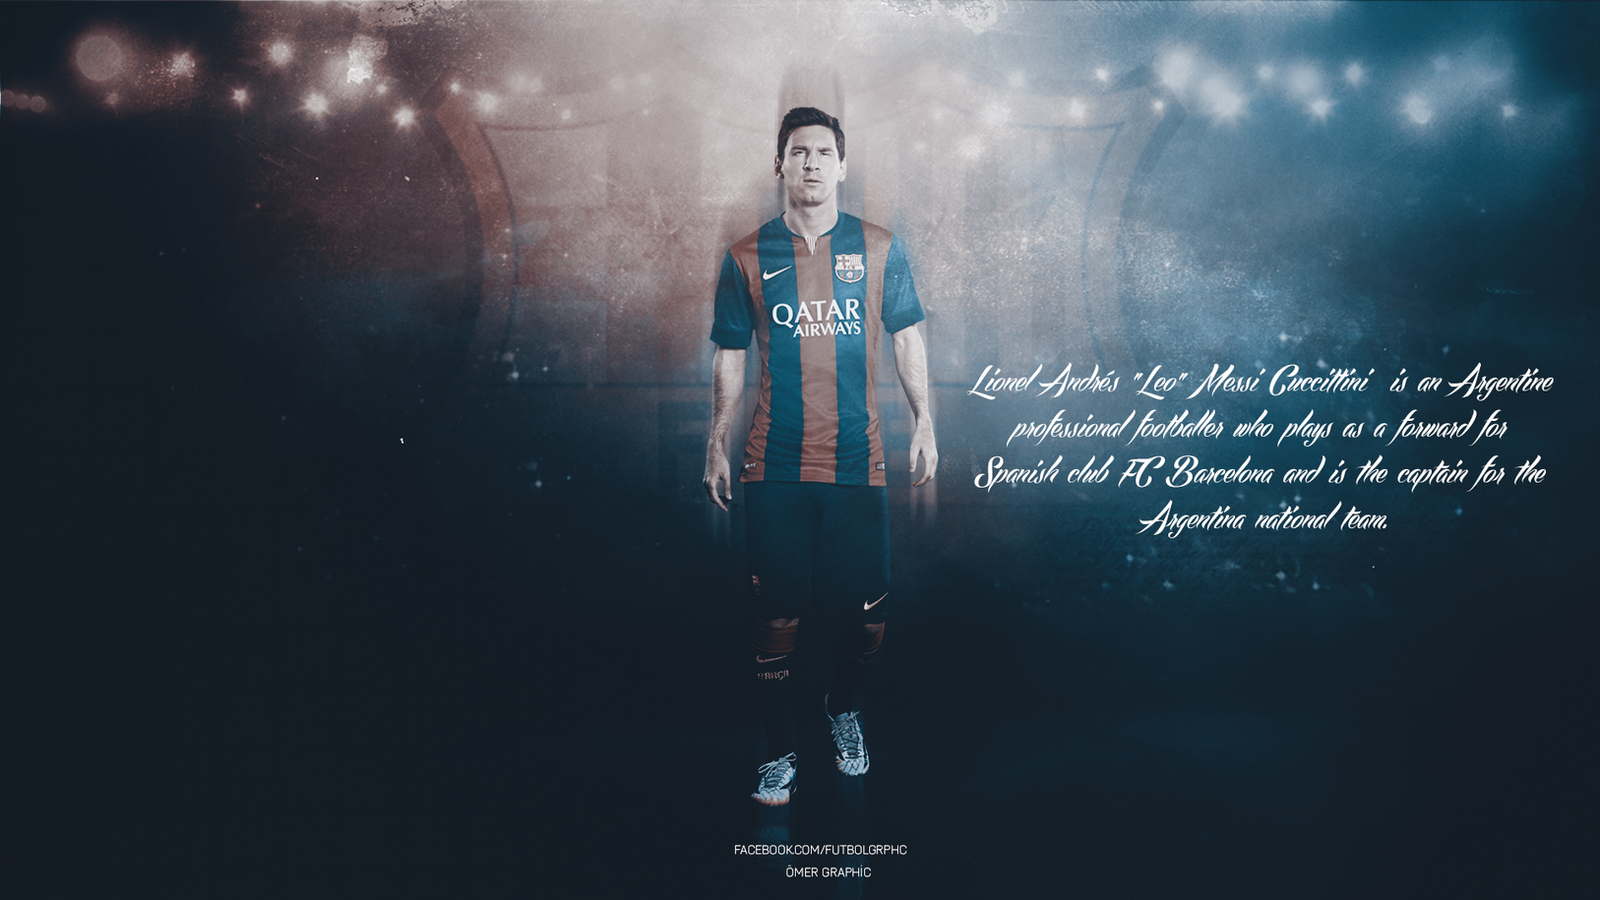 Lionel Messi Wallpaper HD By Neymarmer Lionel Messi Wallpaper HD By  Neymarmer